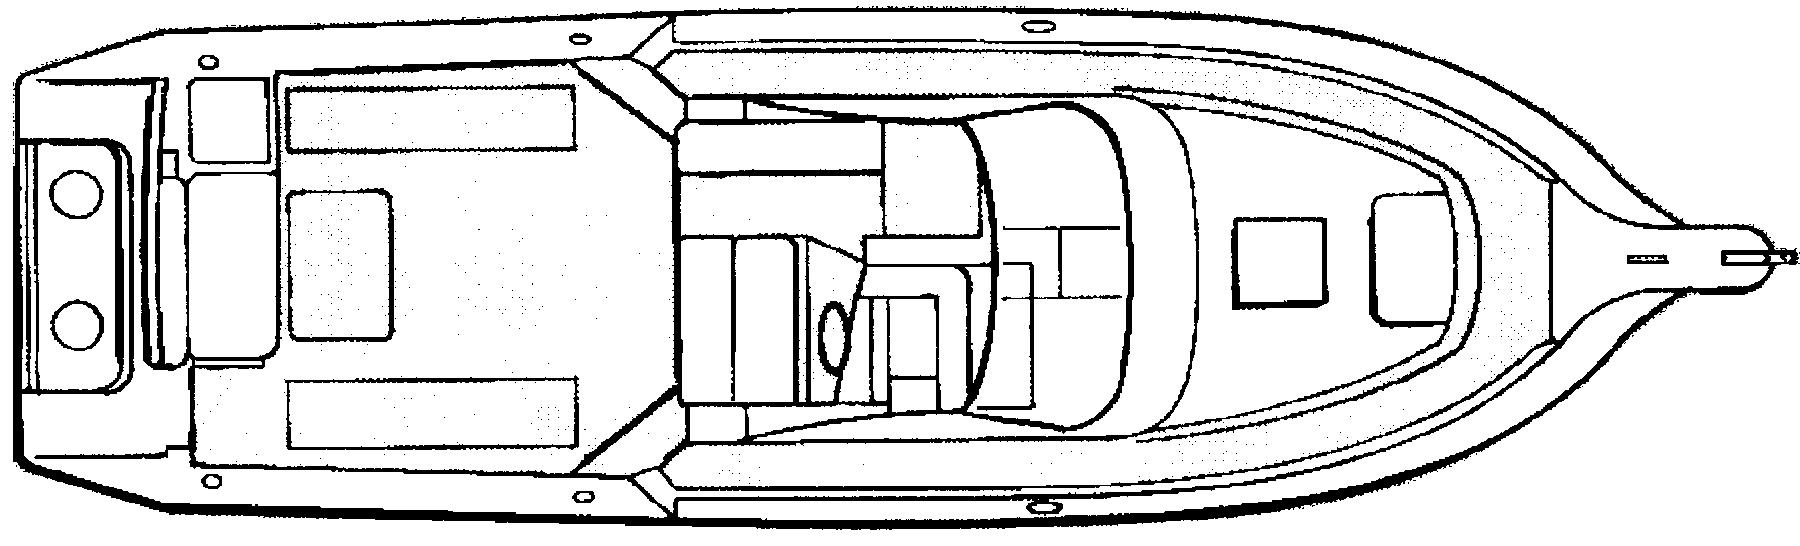 33 Walkaround Floor Plan 1